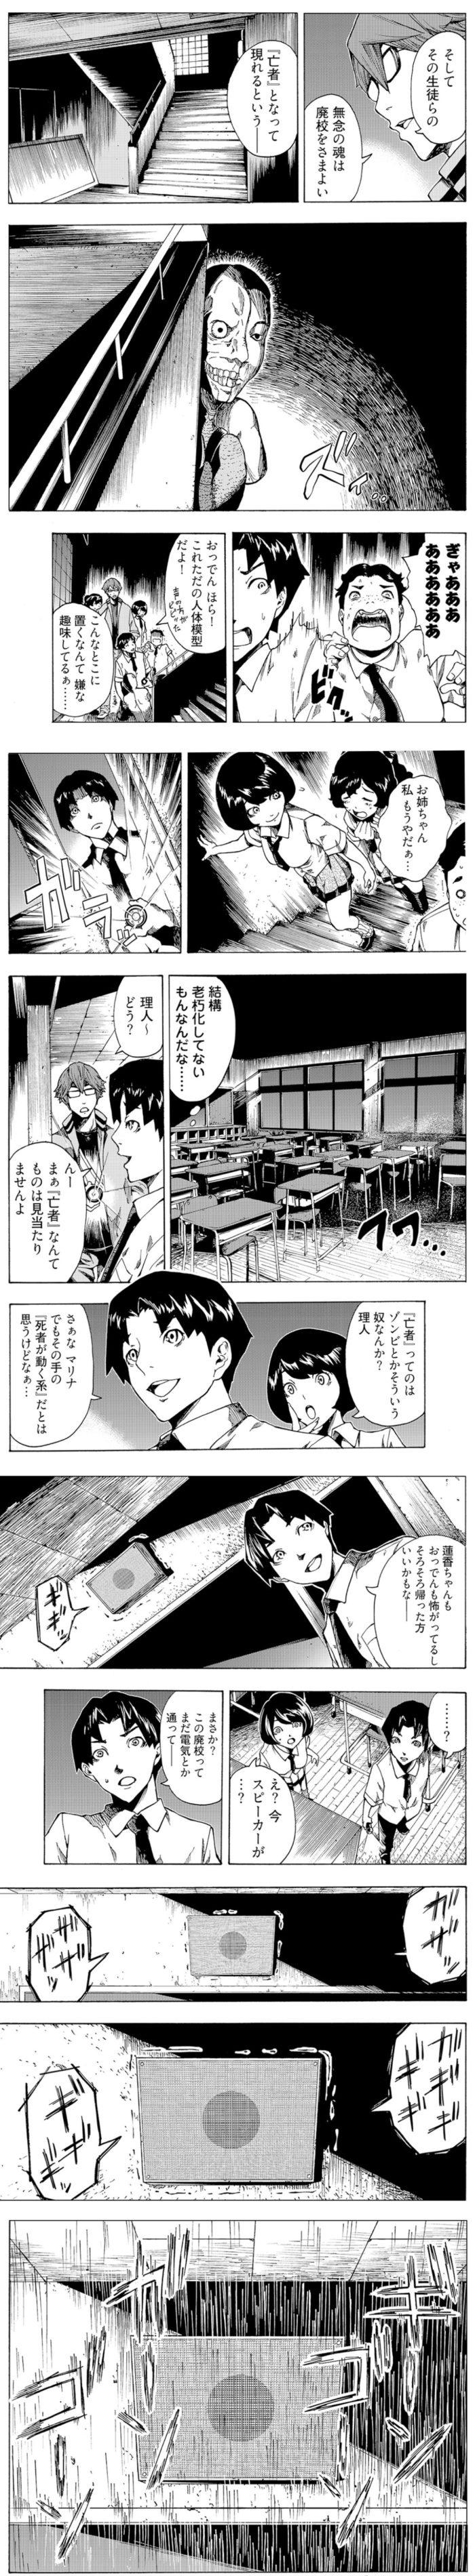 sonoroukani01-03